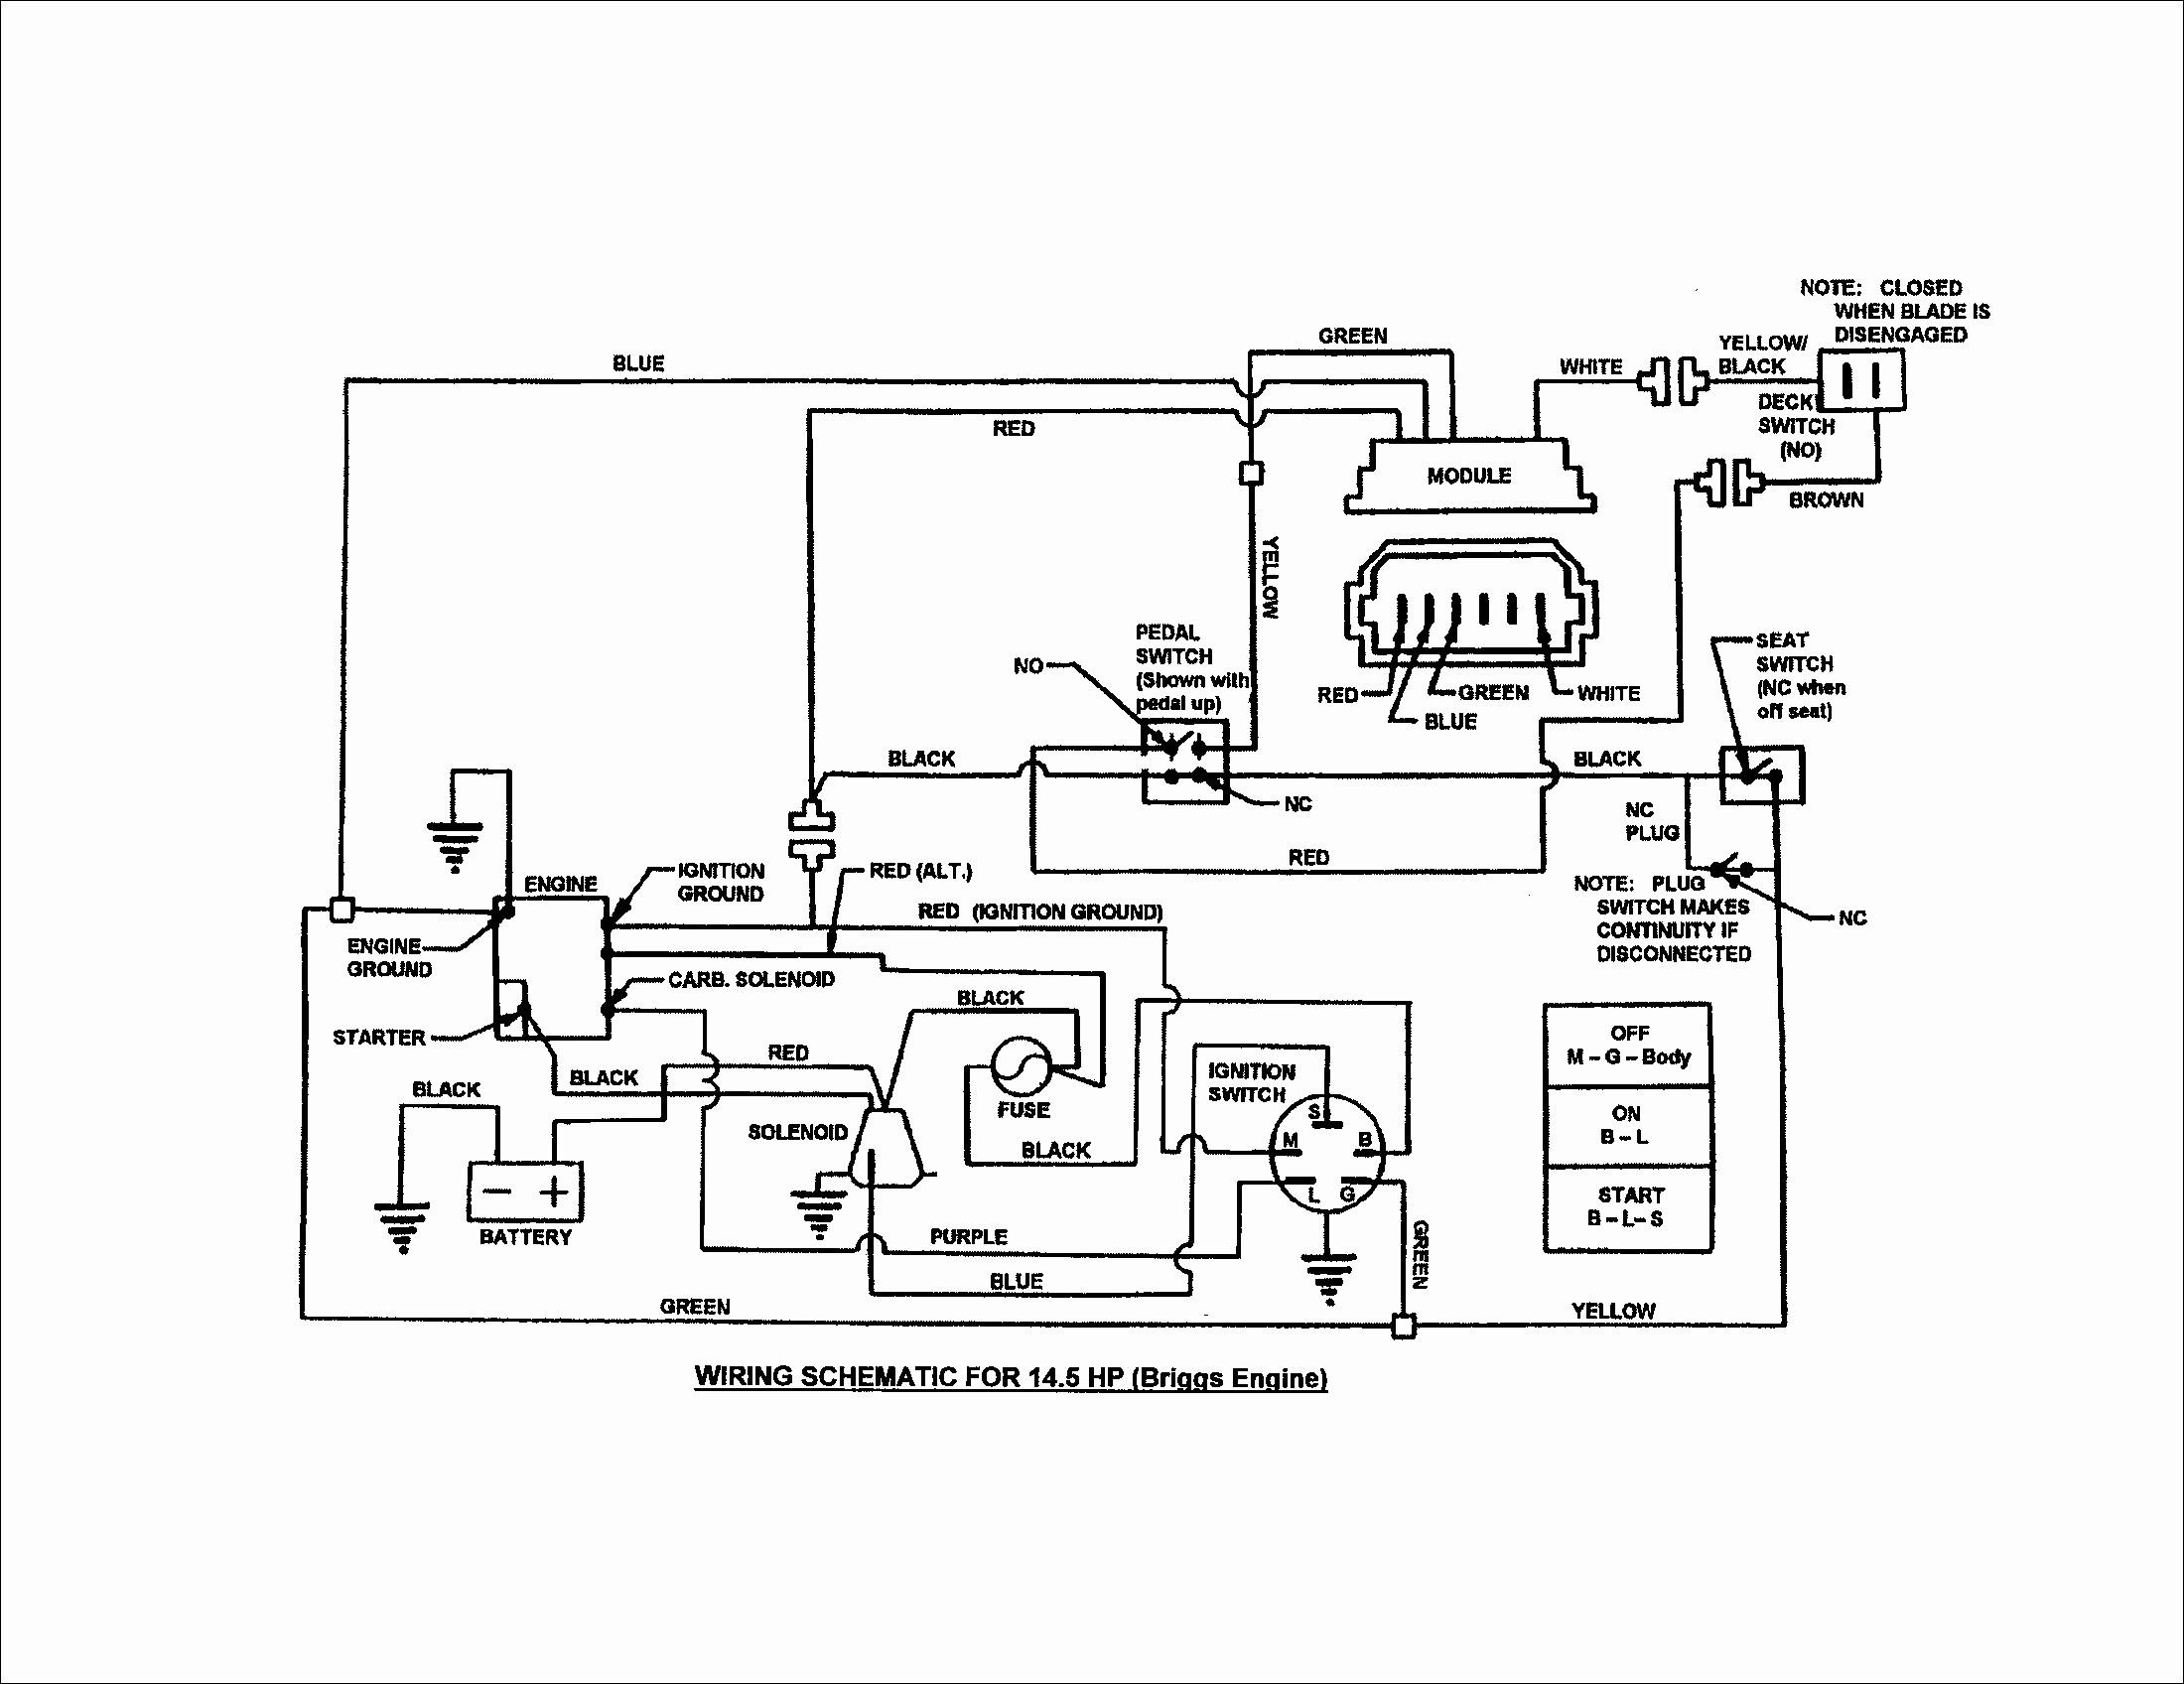 Wiring Diagram For Lt1000 | Manual E-Books - Craftsman Lt1000 Wiring Diagram